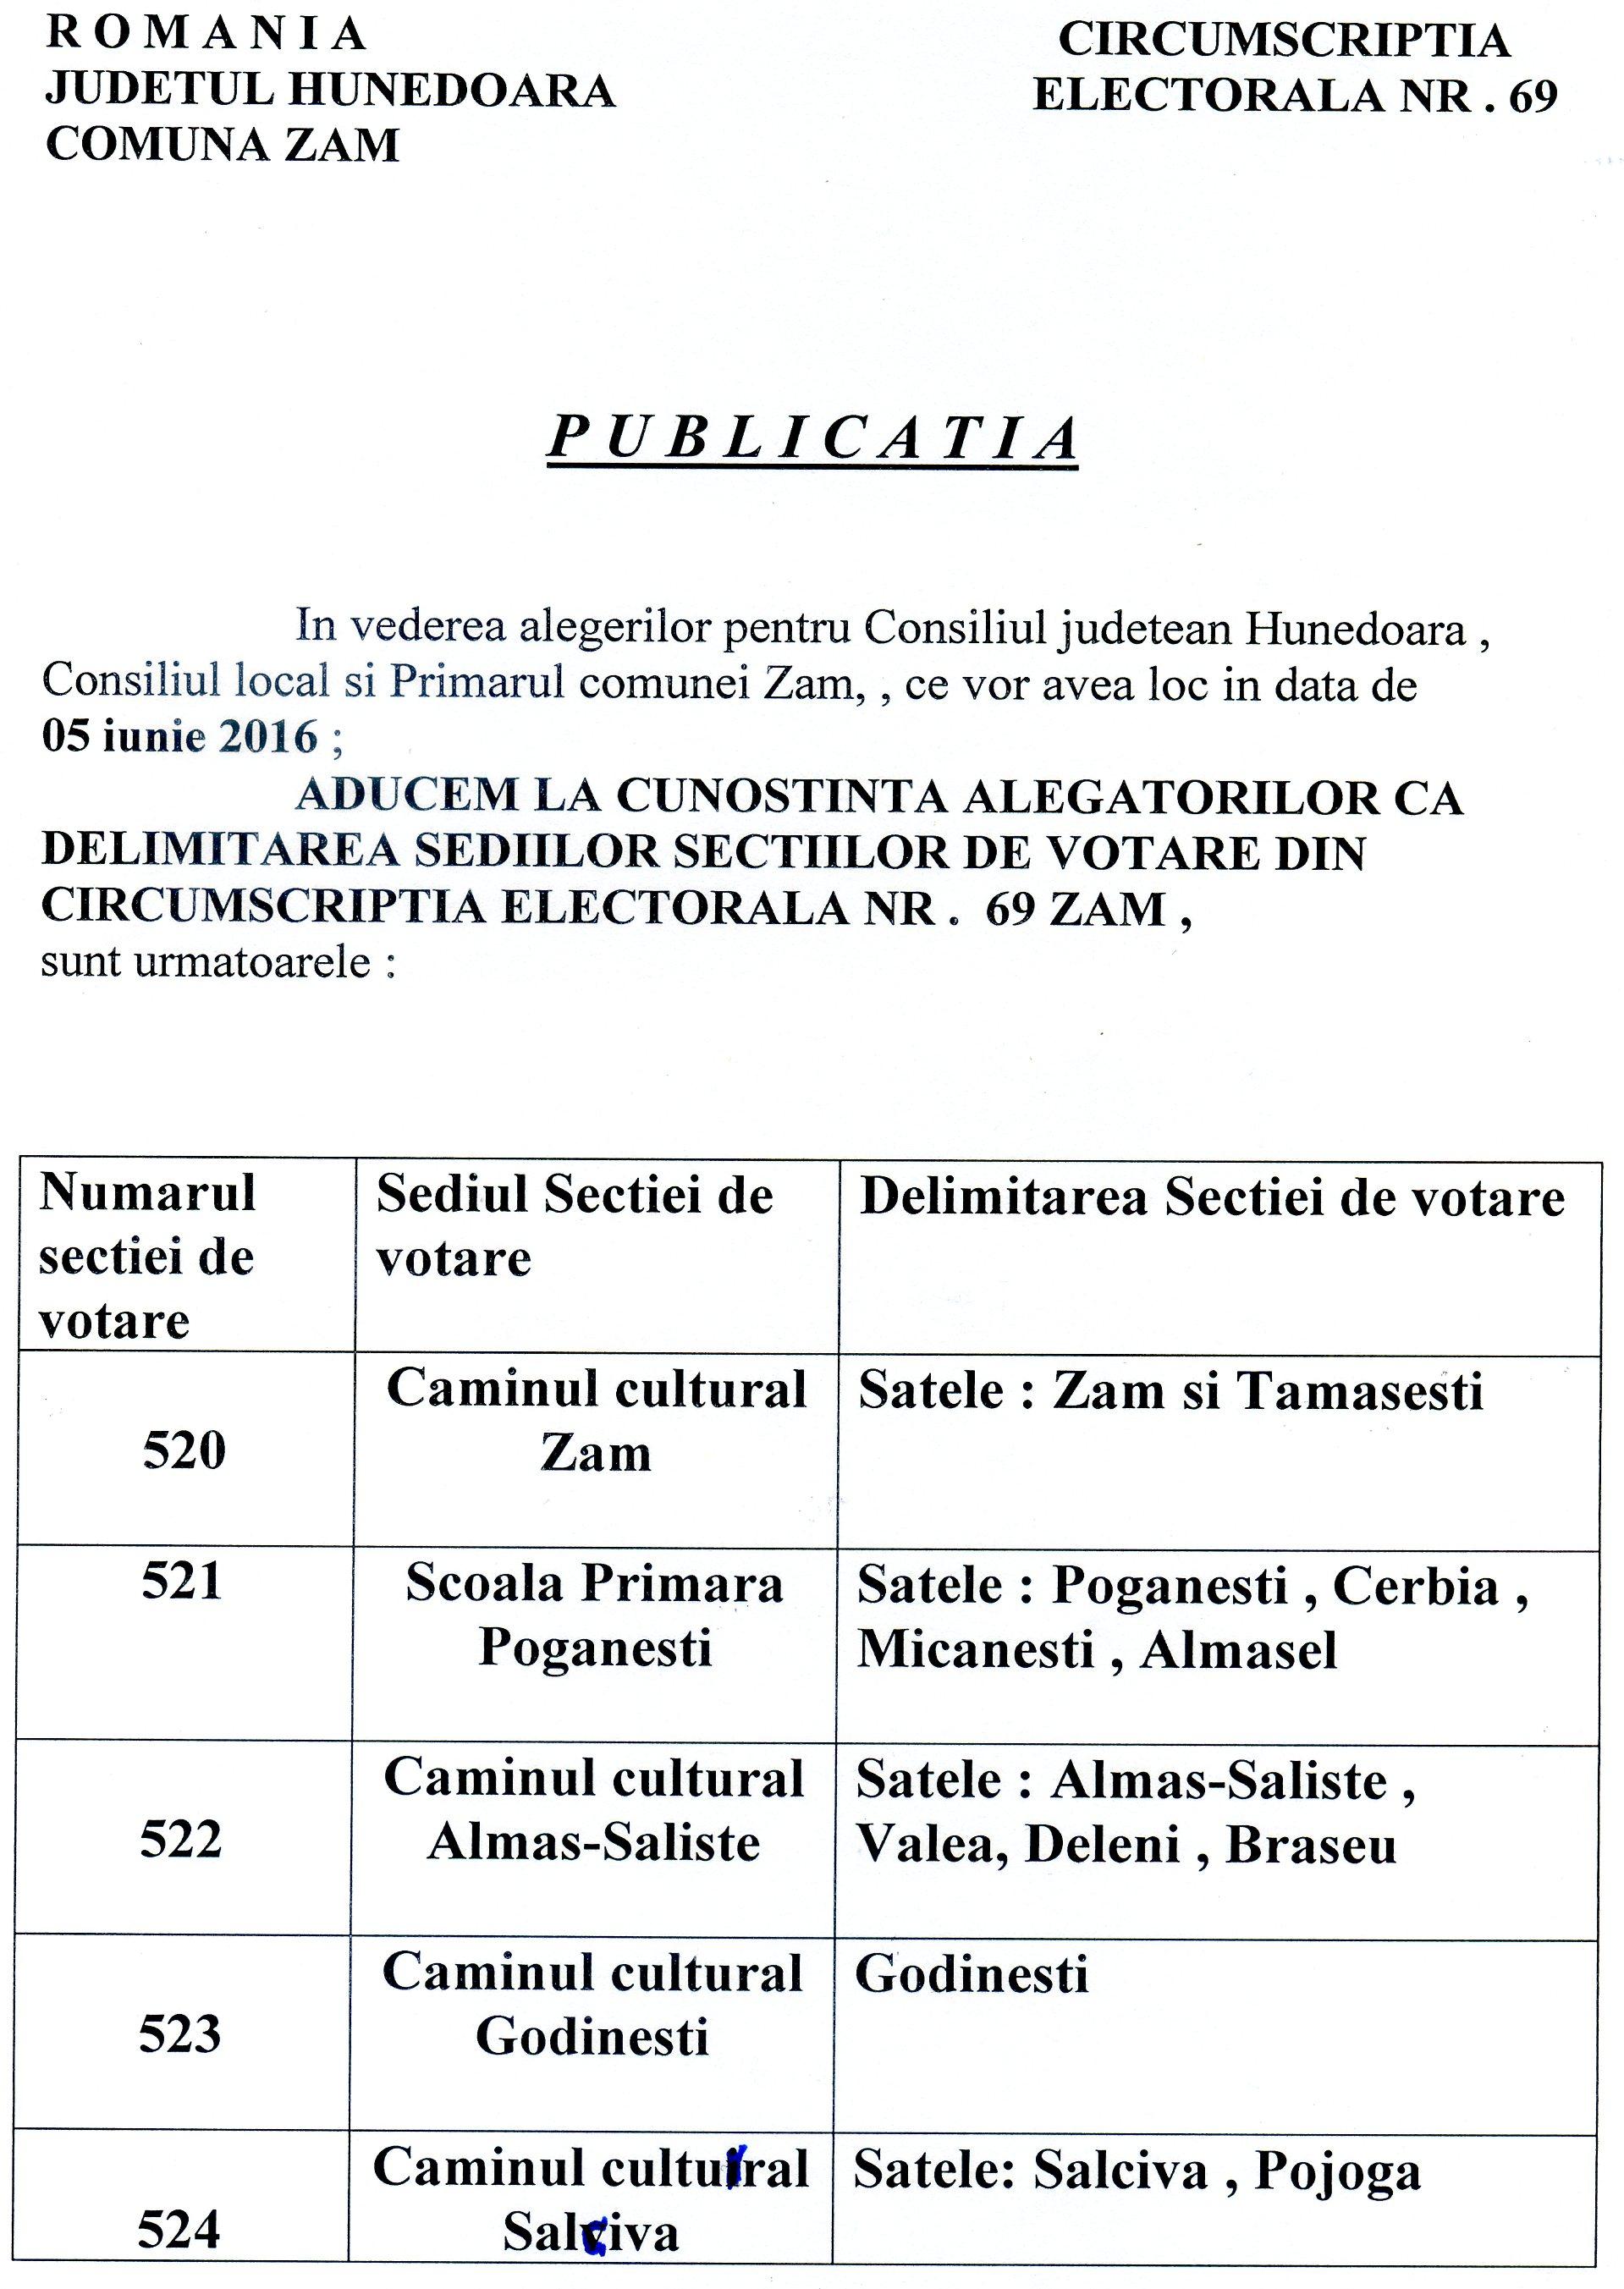 Delimitare sedii sectii votare Comuna Zam - 05 iunie 2016 - Consiliul jud. HD